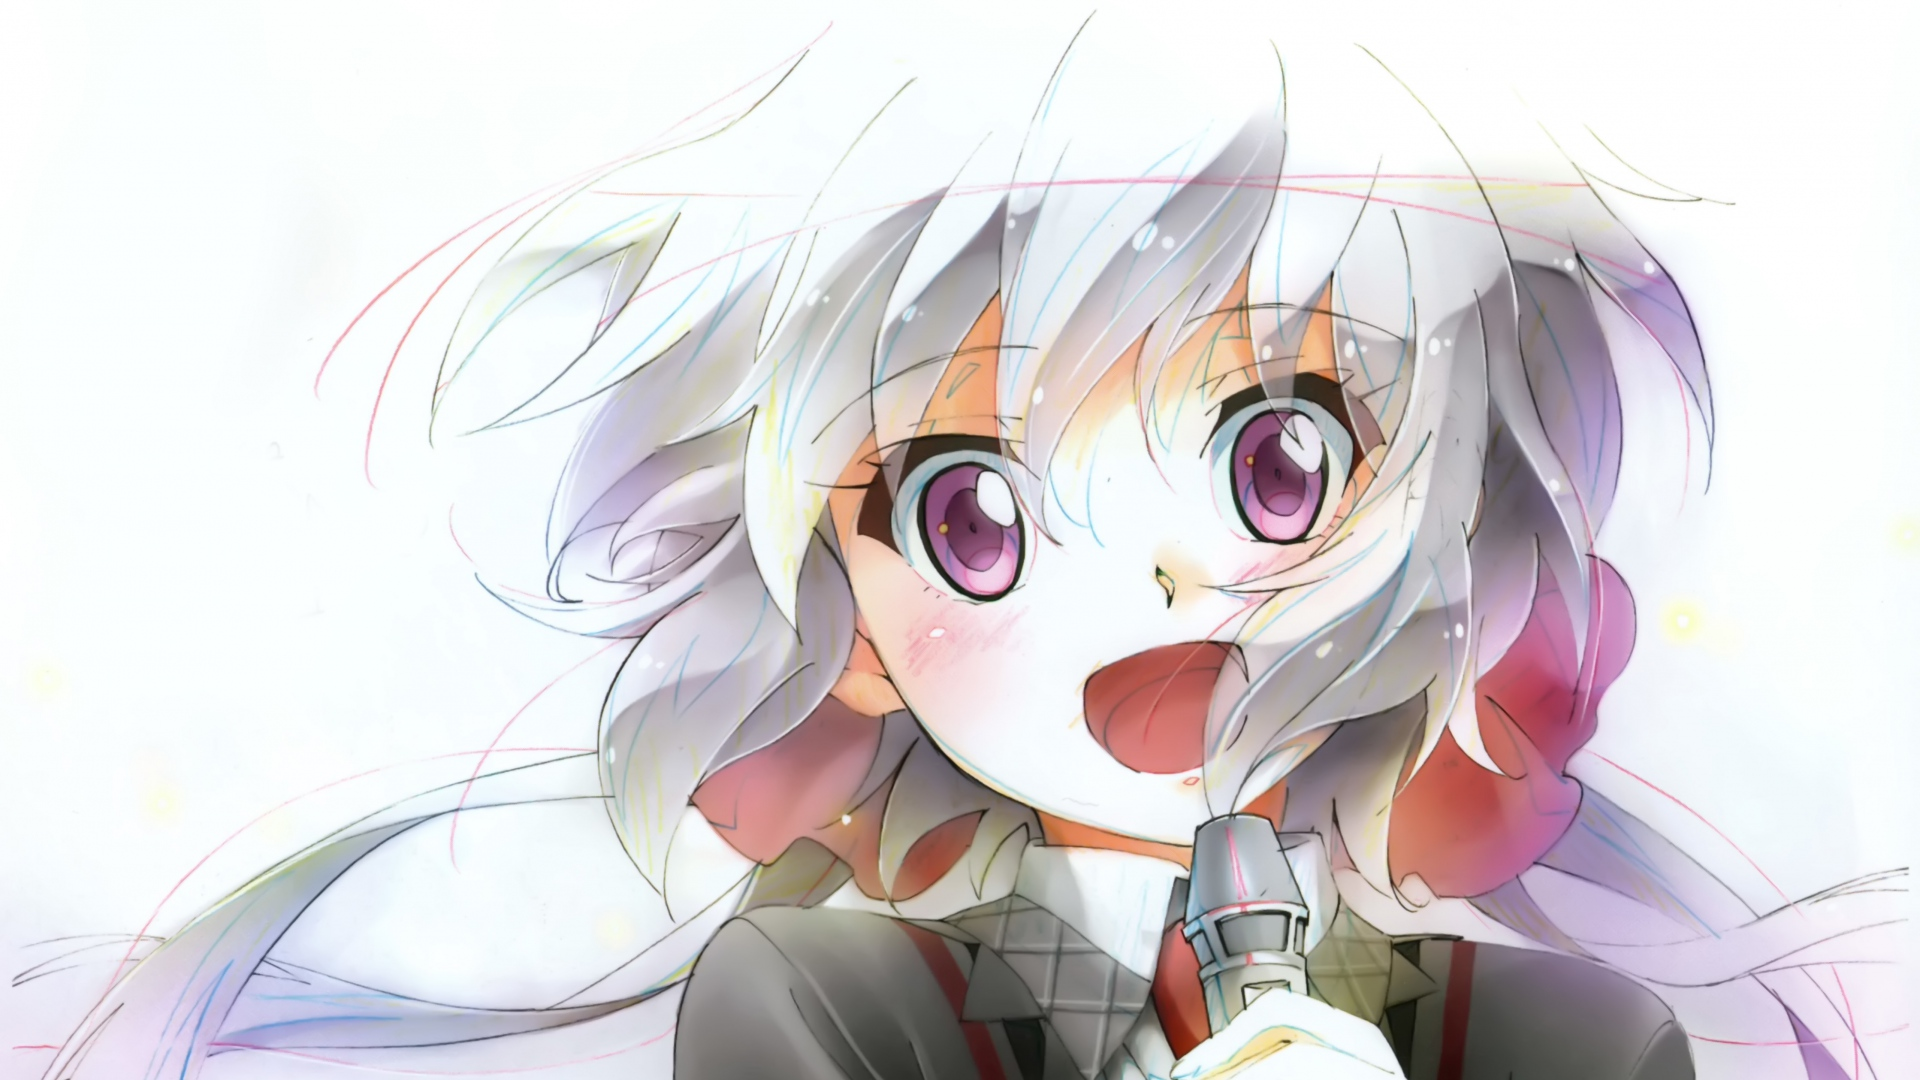 hd hintergrundbilder mädchen gesicht mikrofon senk zesshou symphogear chris yukine 1920x1080